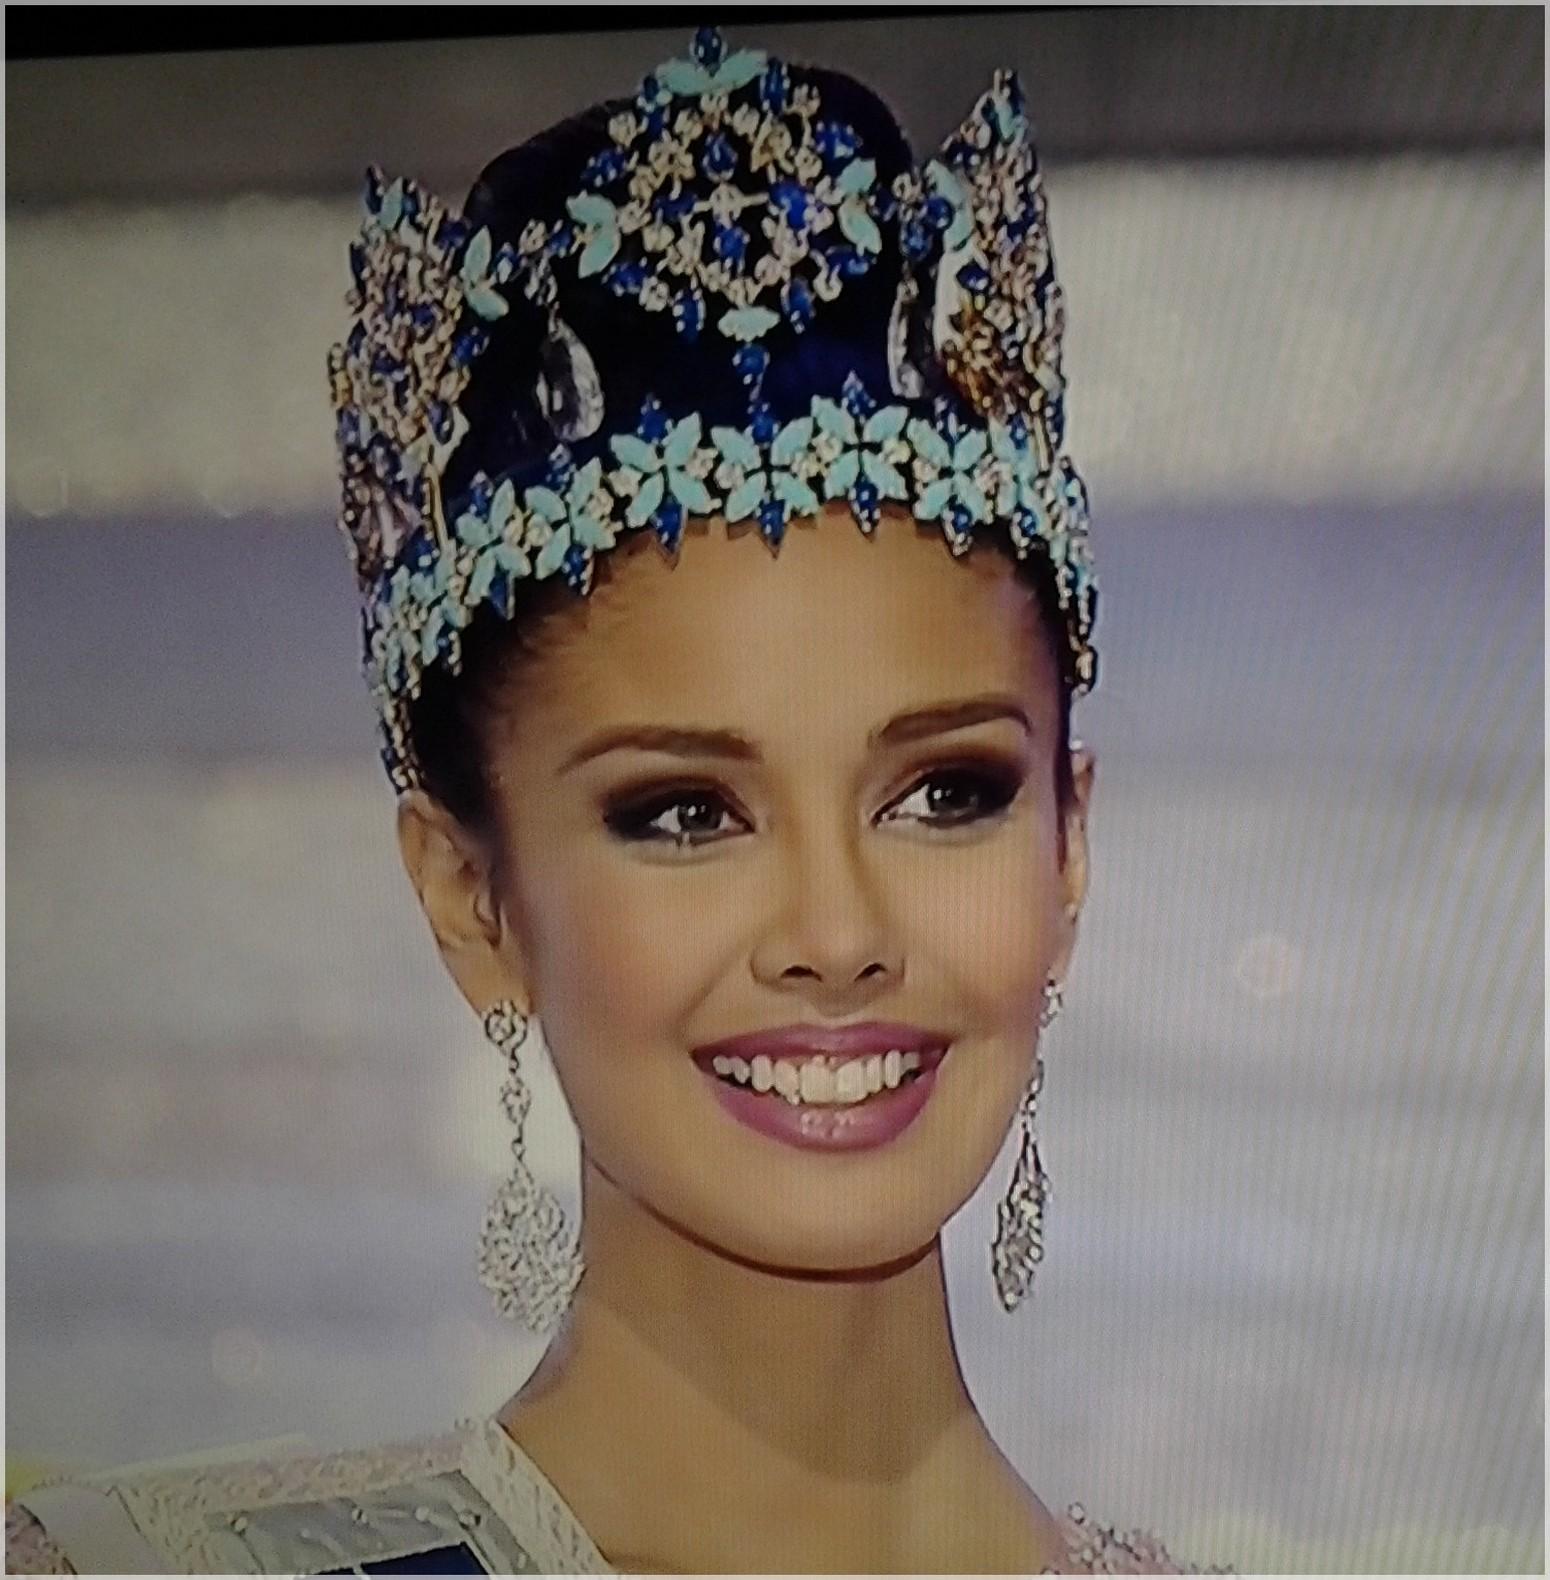 http://medias-presse.info/wp-content/uploads/2013/10/Miss-monde-2013-MPI.jpg